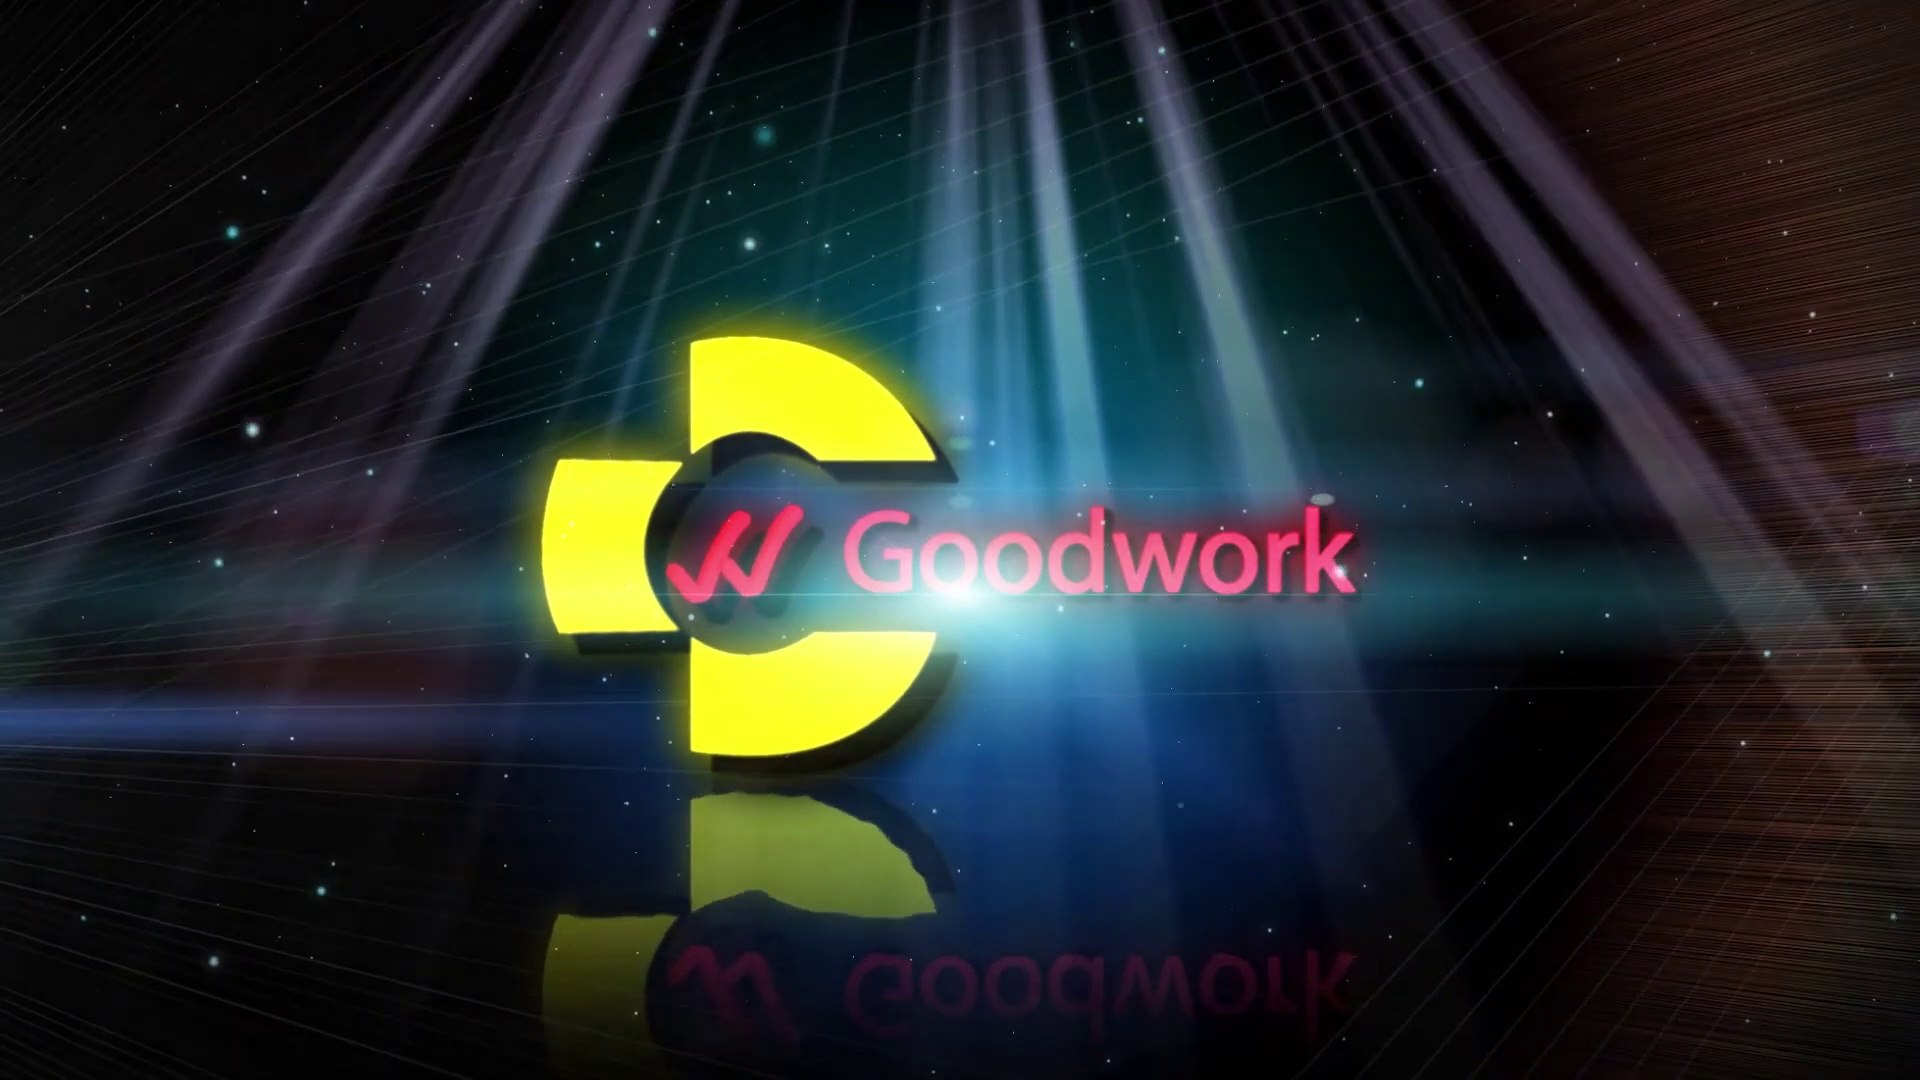 Goodwork Entertainment